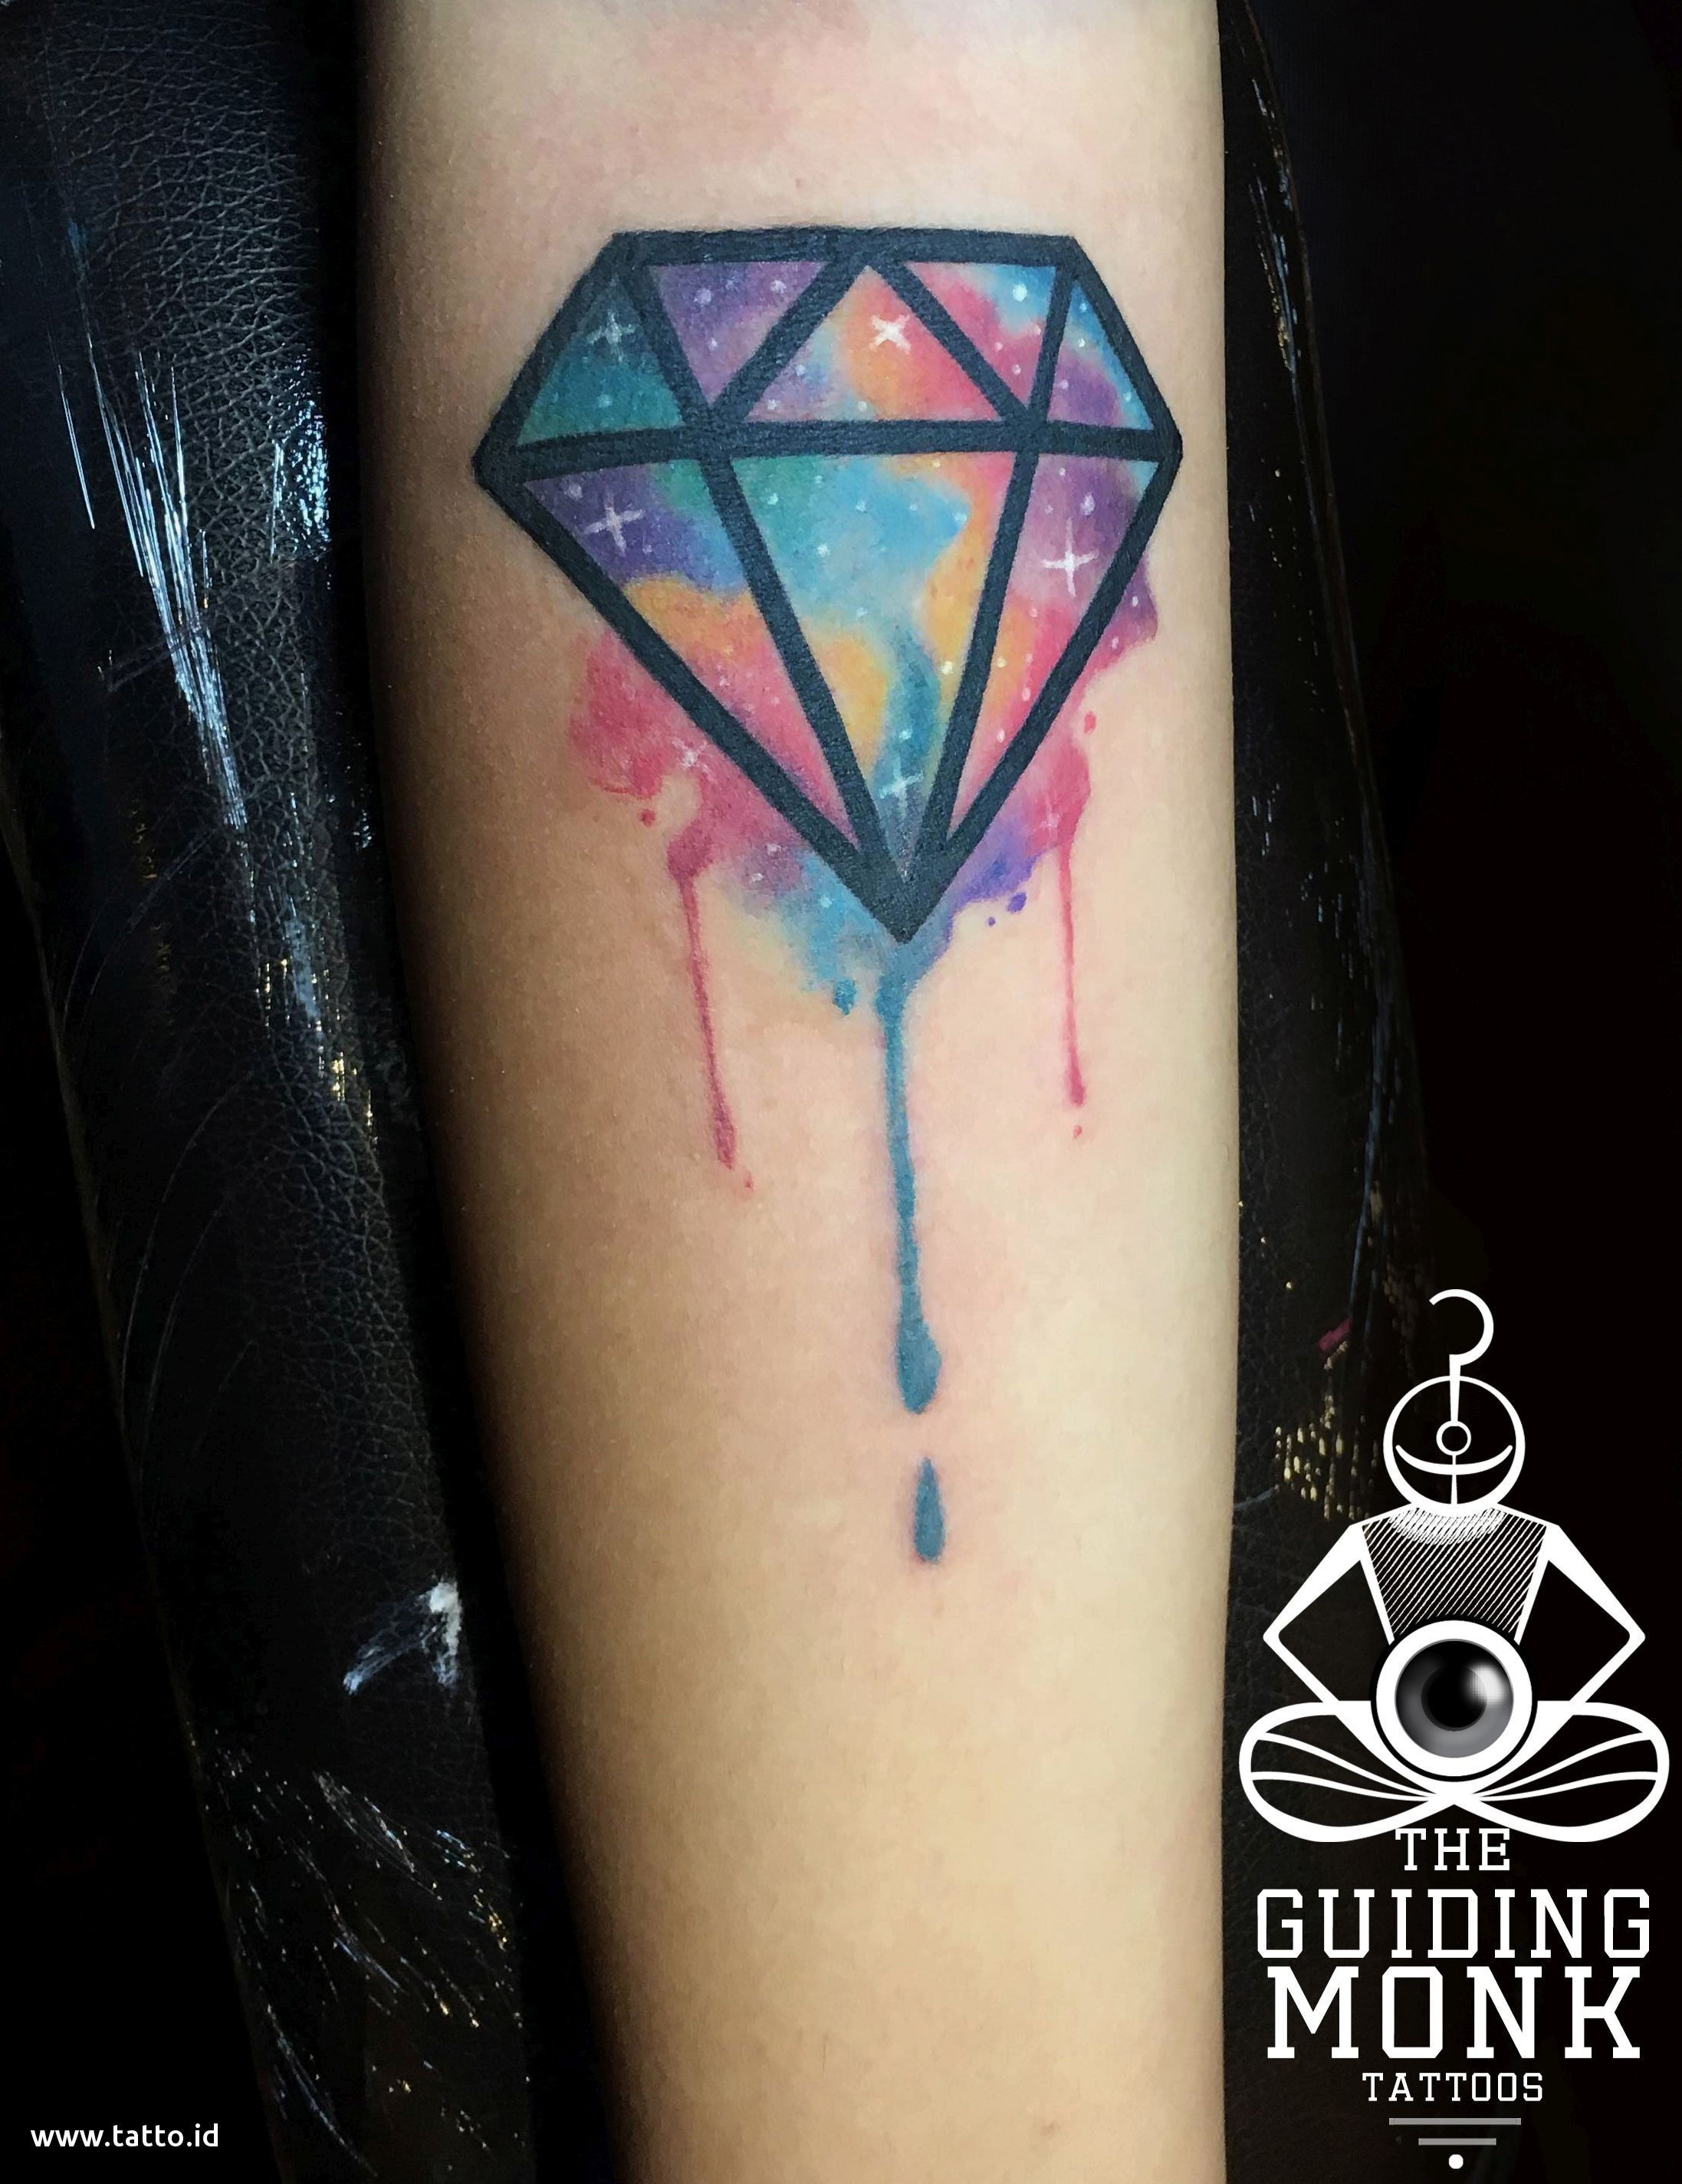 81 Gambar Foto Tato Diamond Check More At Https Www Tatto Id Tato Diamond Diamond Tattoo Designs Diamond Tattoos Henna Tattoo Designs Simple